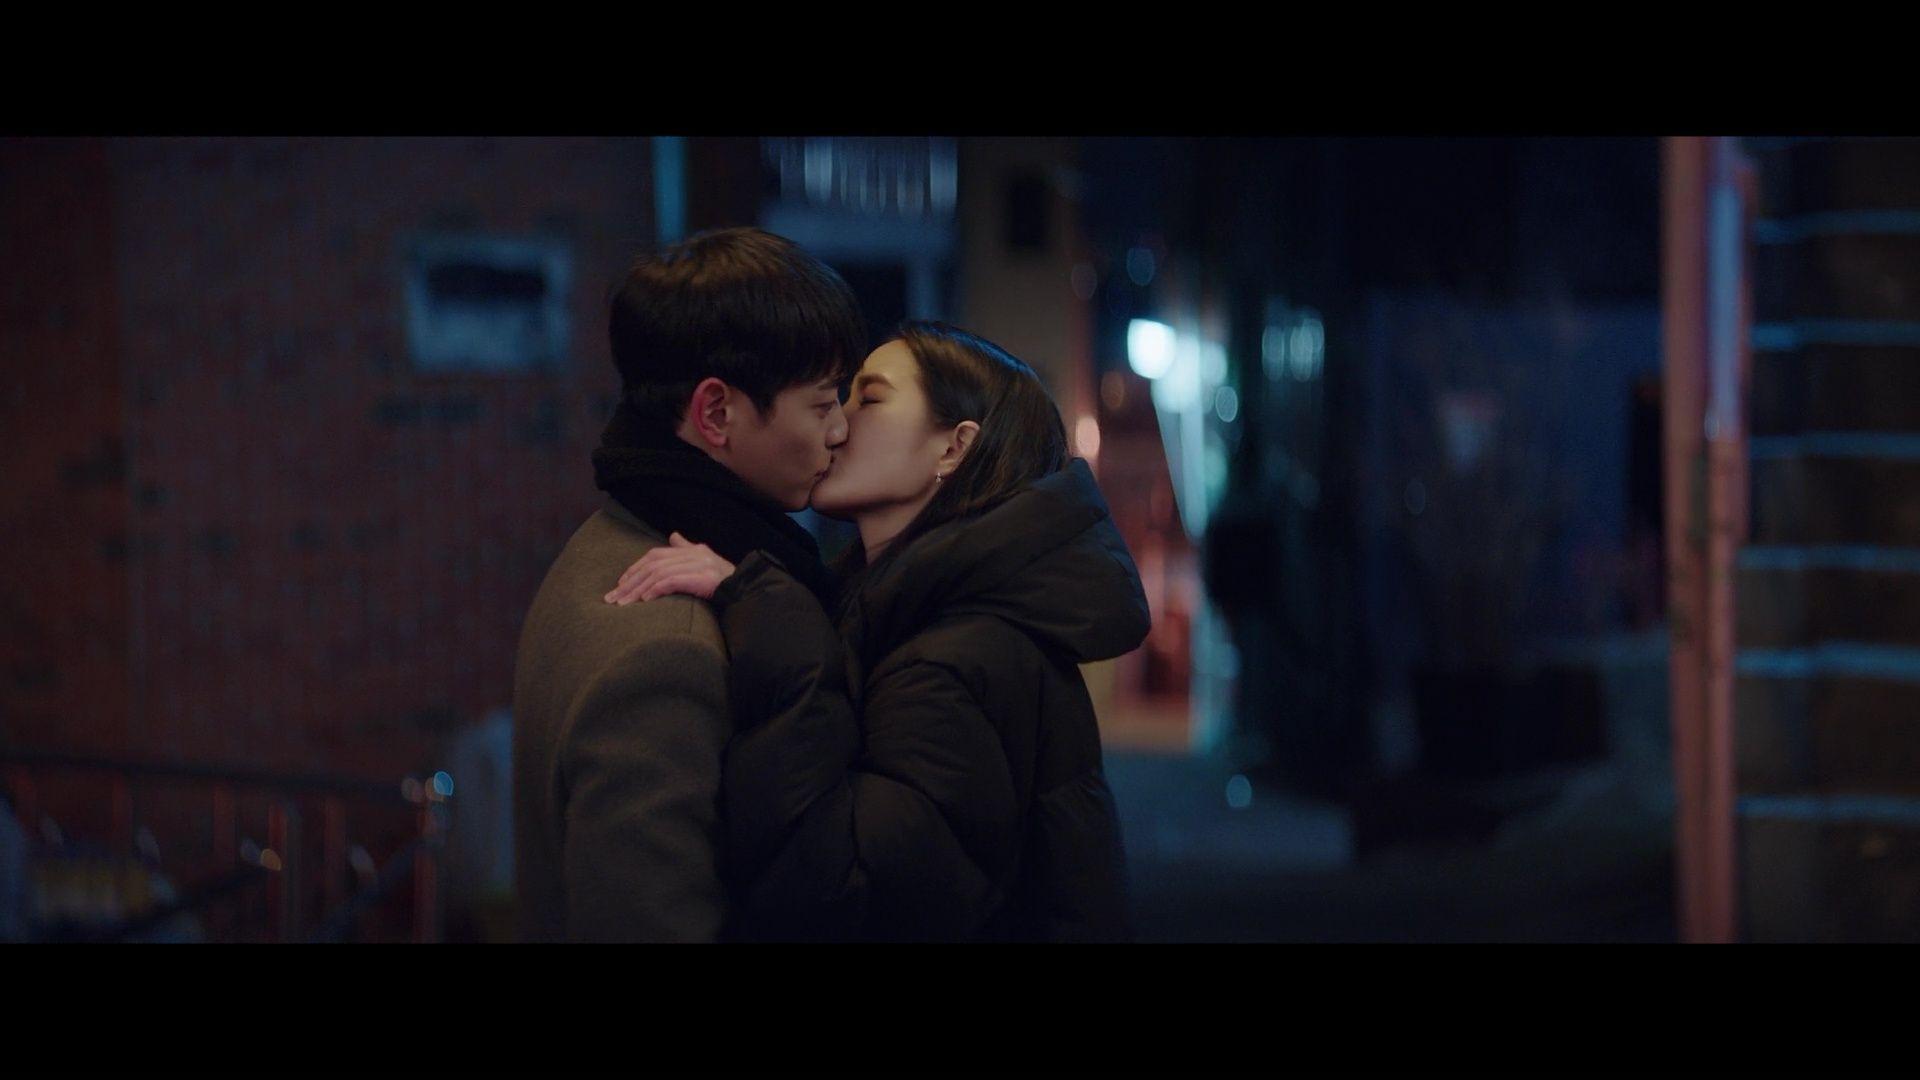 City Couple's Way of Love